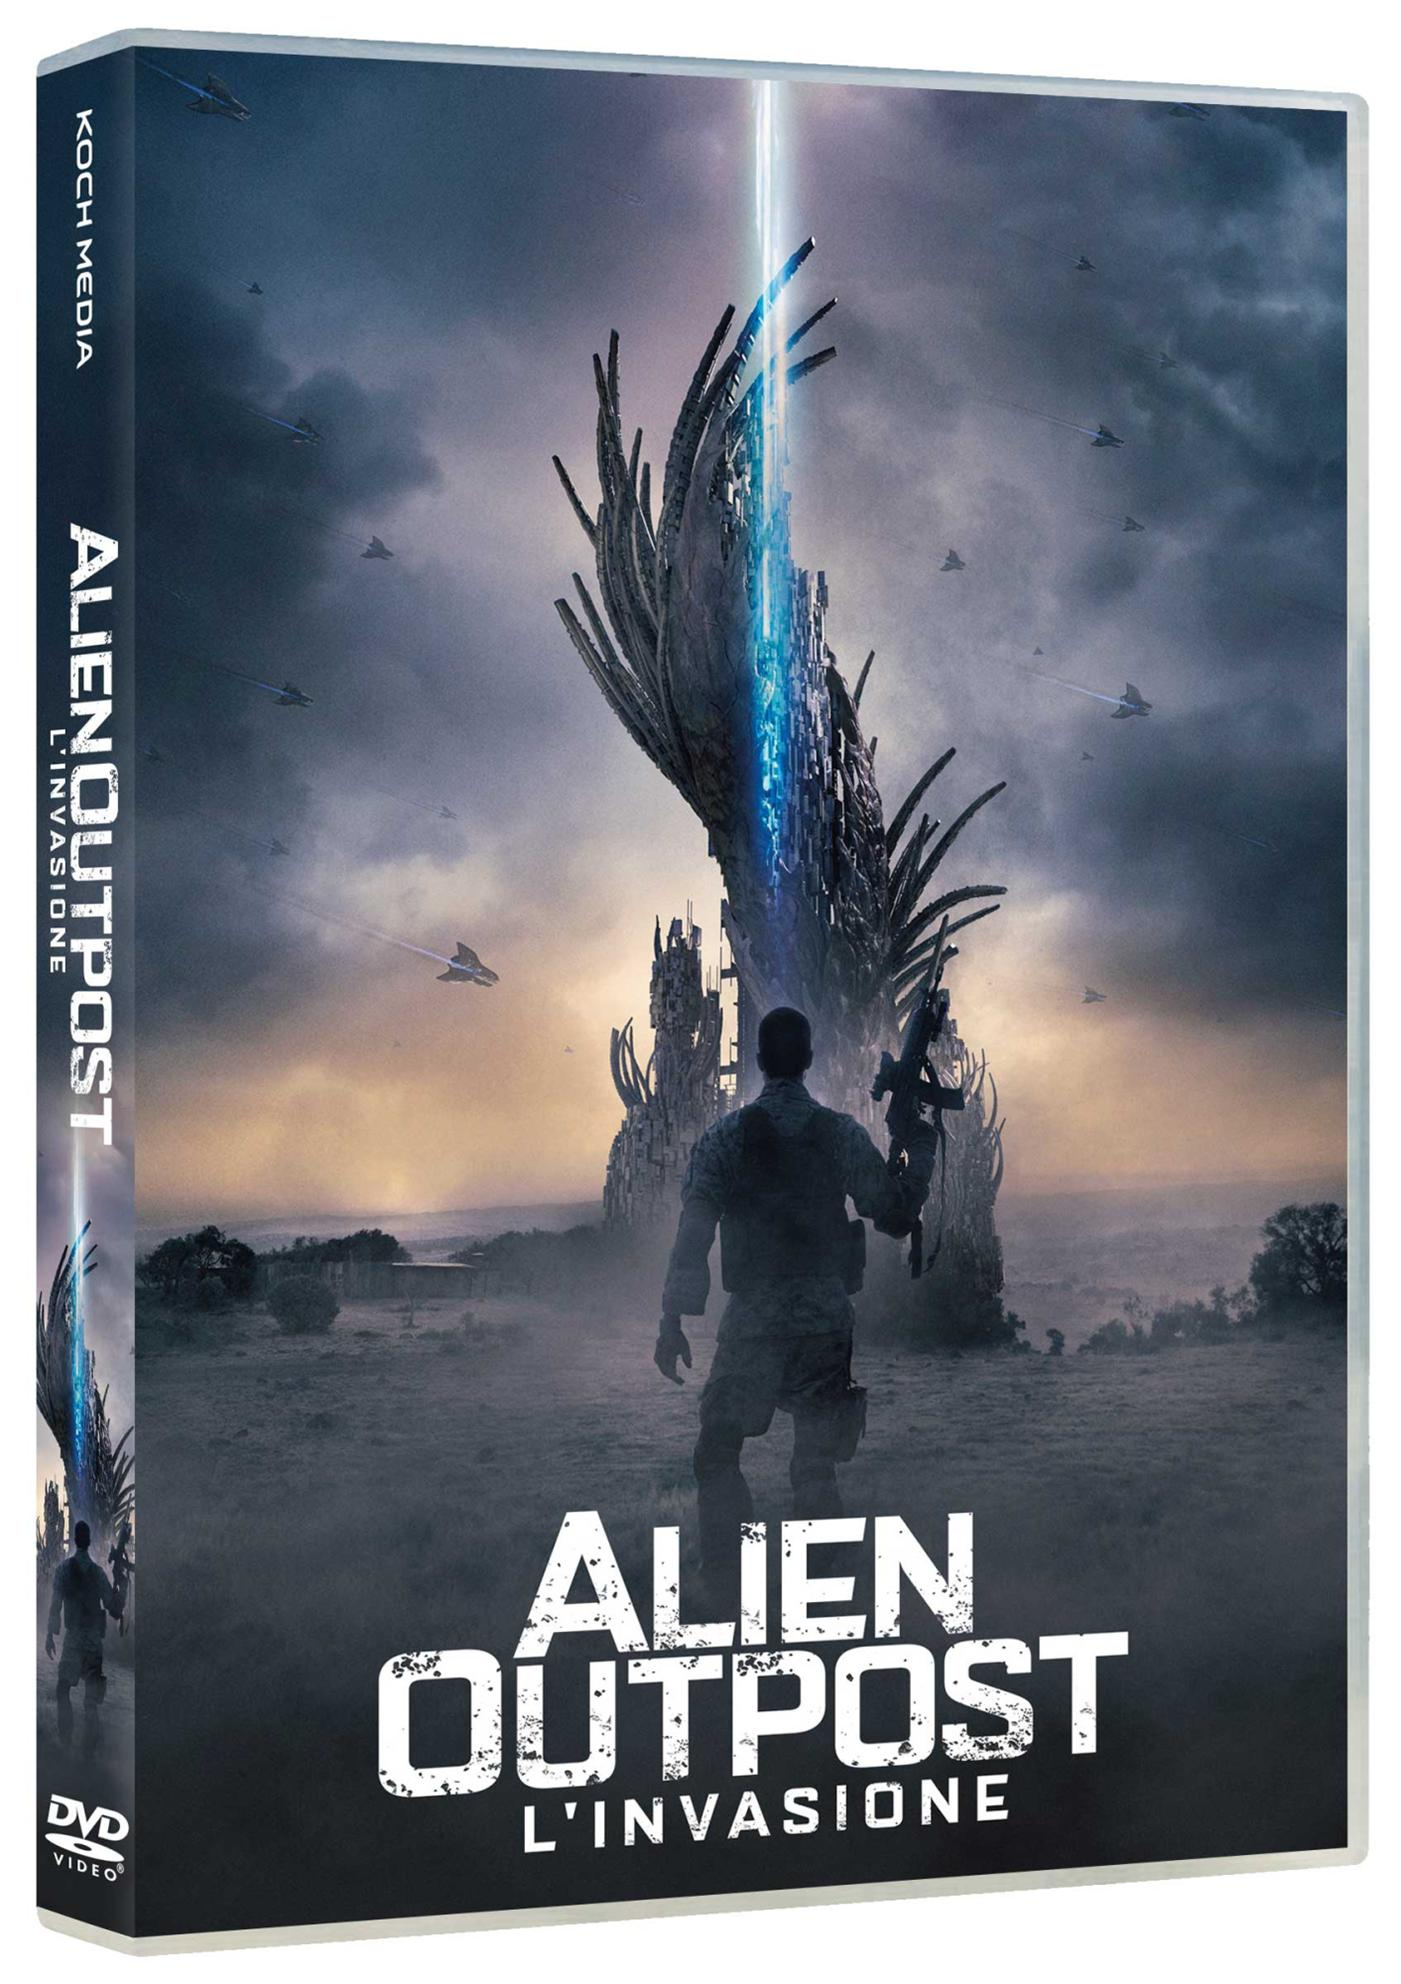 ALIEN OUTPOST - L'INVASIONE (DVD)